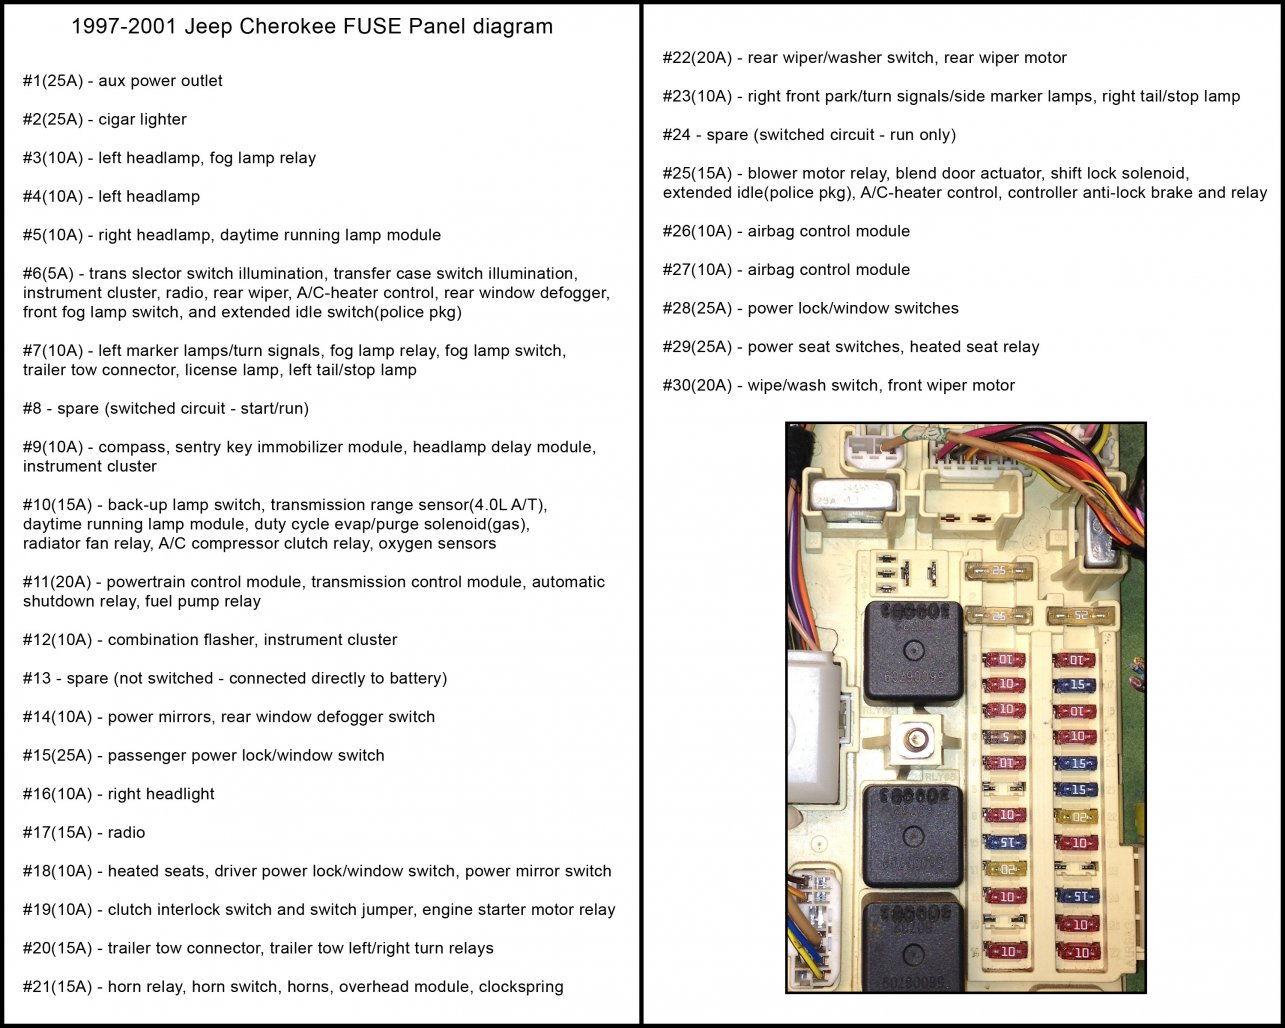 1997 Jeep Cherokee Relay Diagram - Machine Repair Manual Jeep Flasher Relay Wiring Diagram on